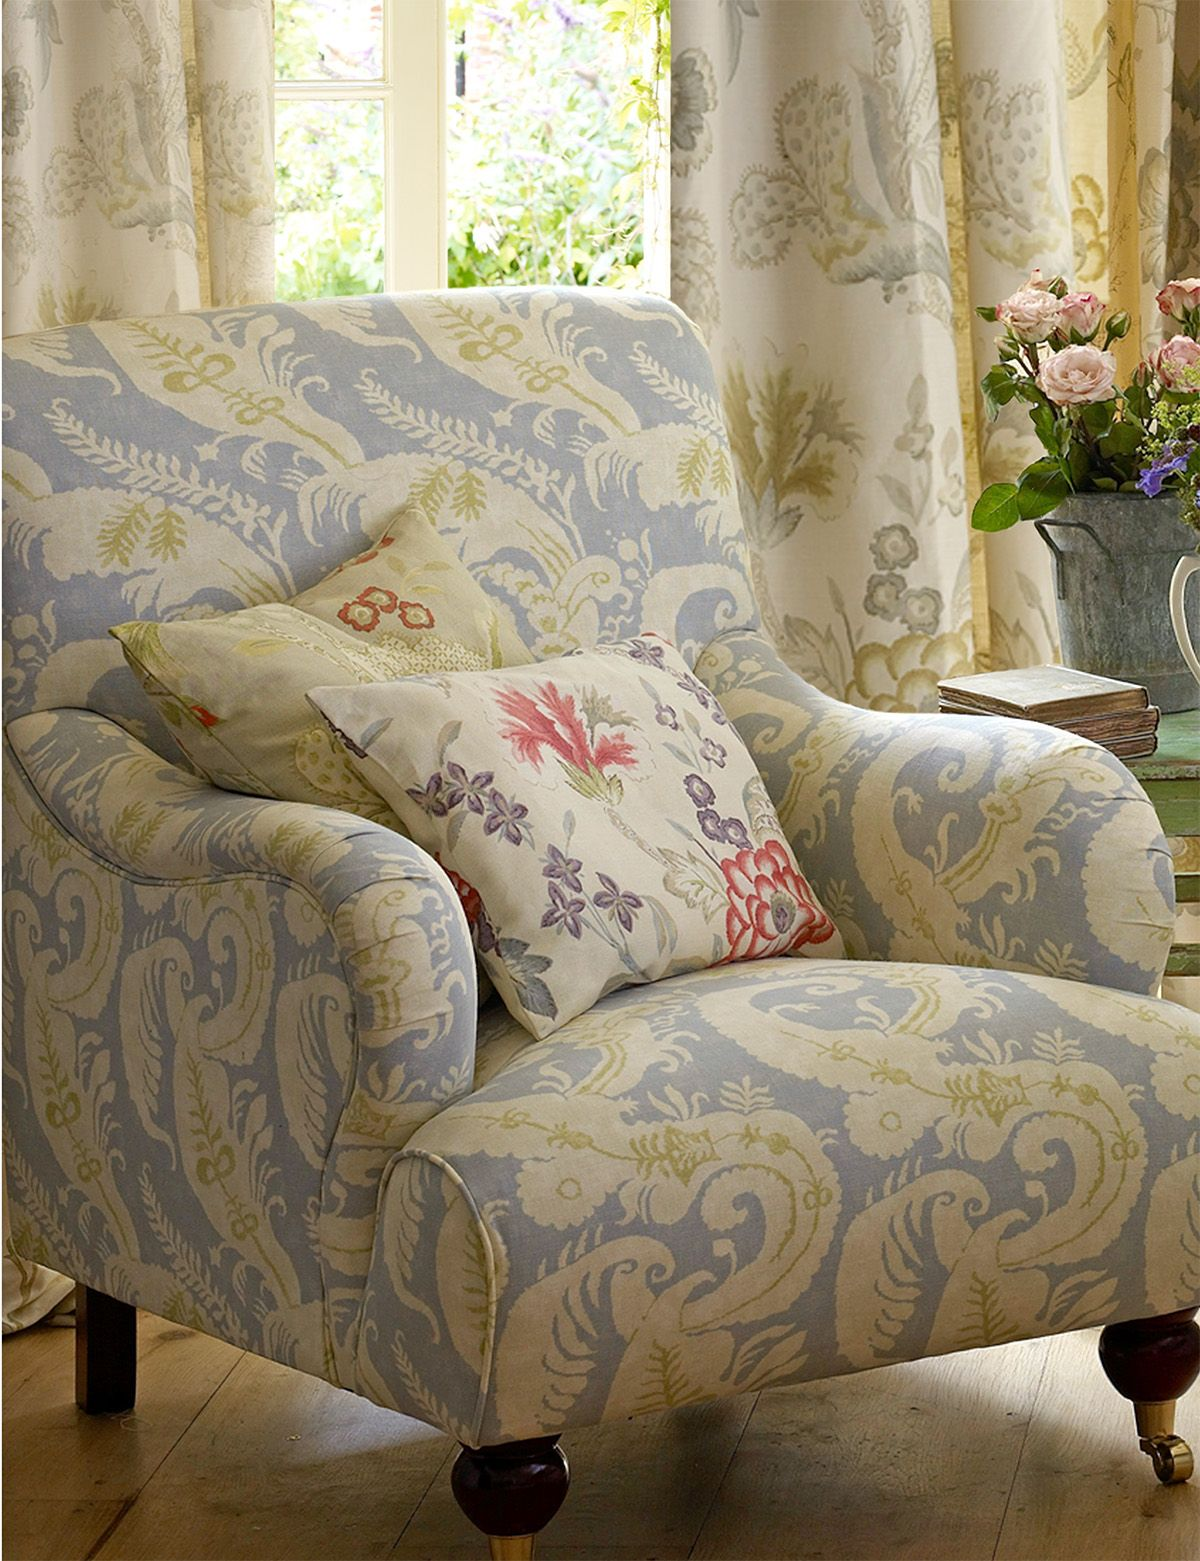 english prints pour s 39 asseoir pinterest chaise. Black Bedroom Furniture Sets. Home Design Ideas